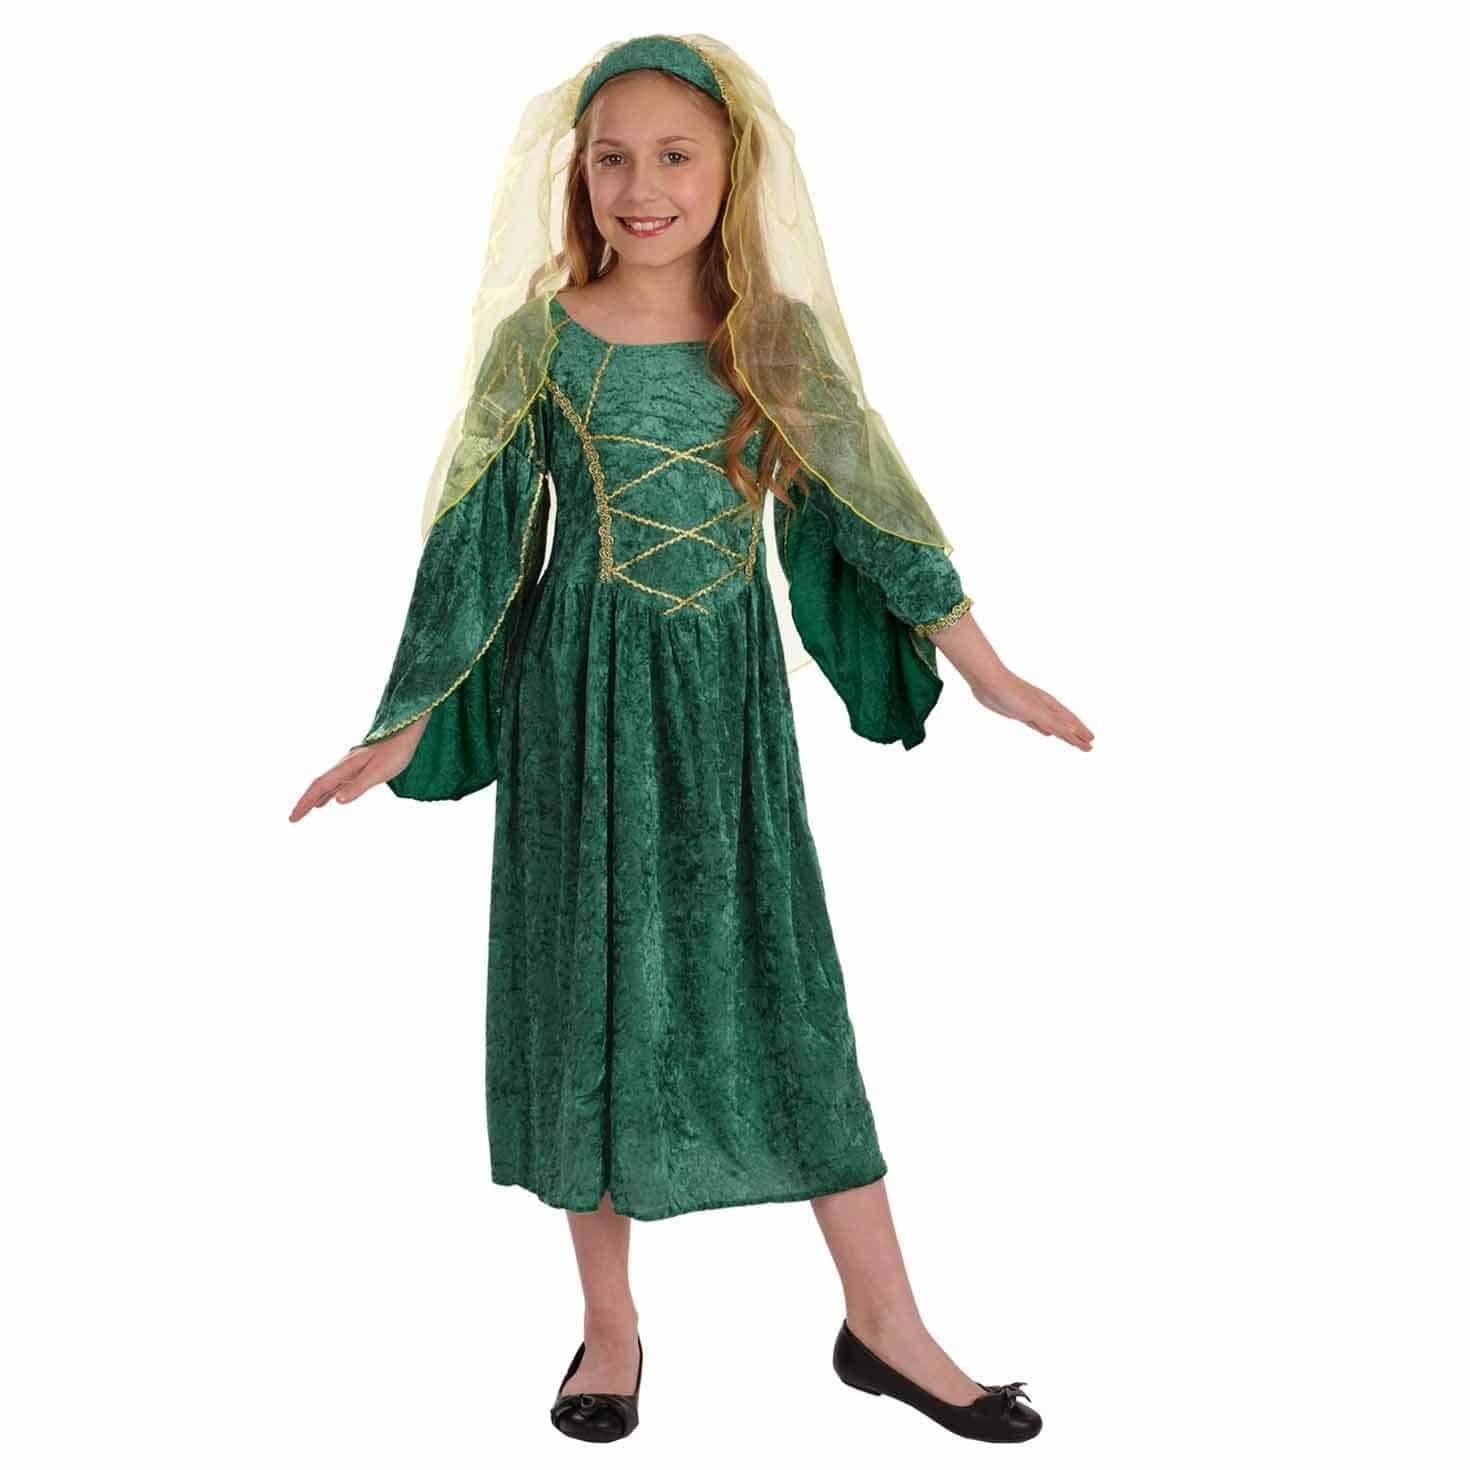 Disfraz De Princesa Medieval Para Niña Verde